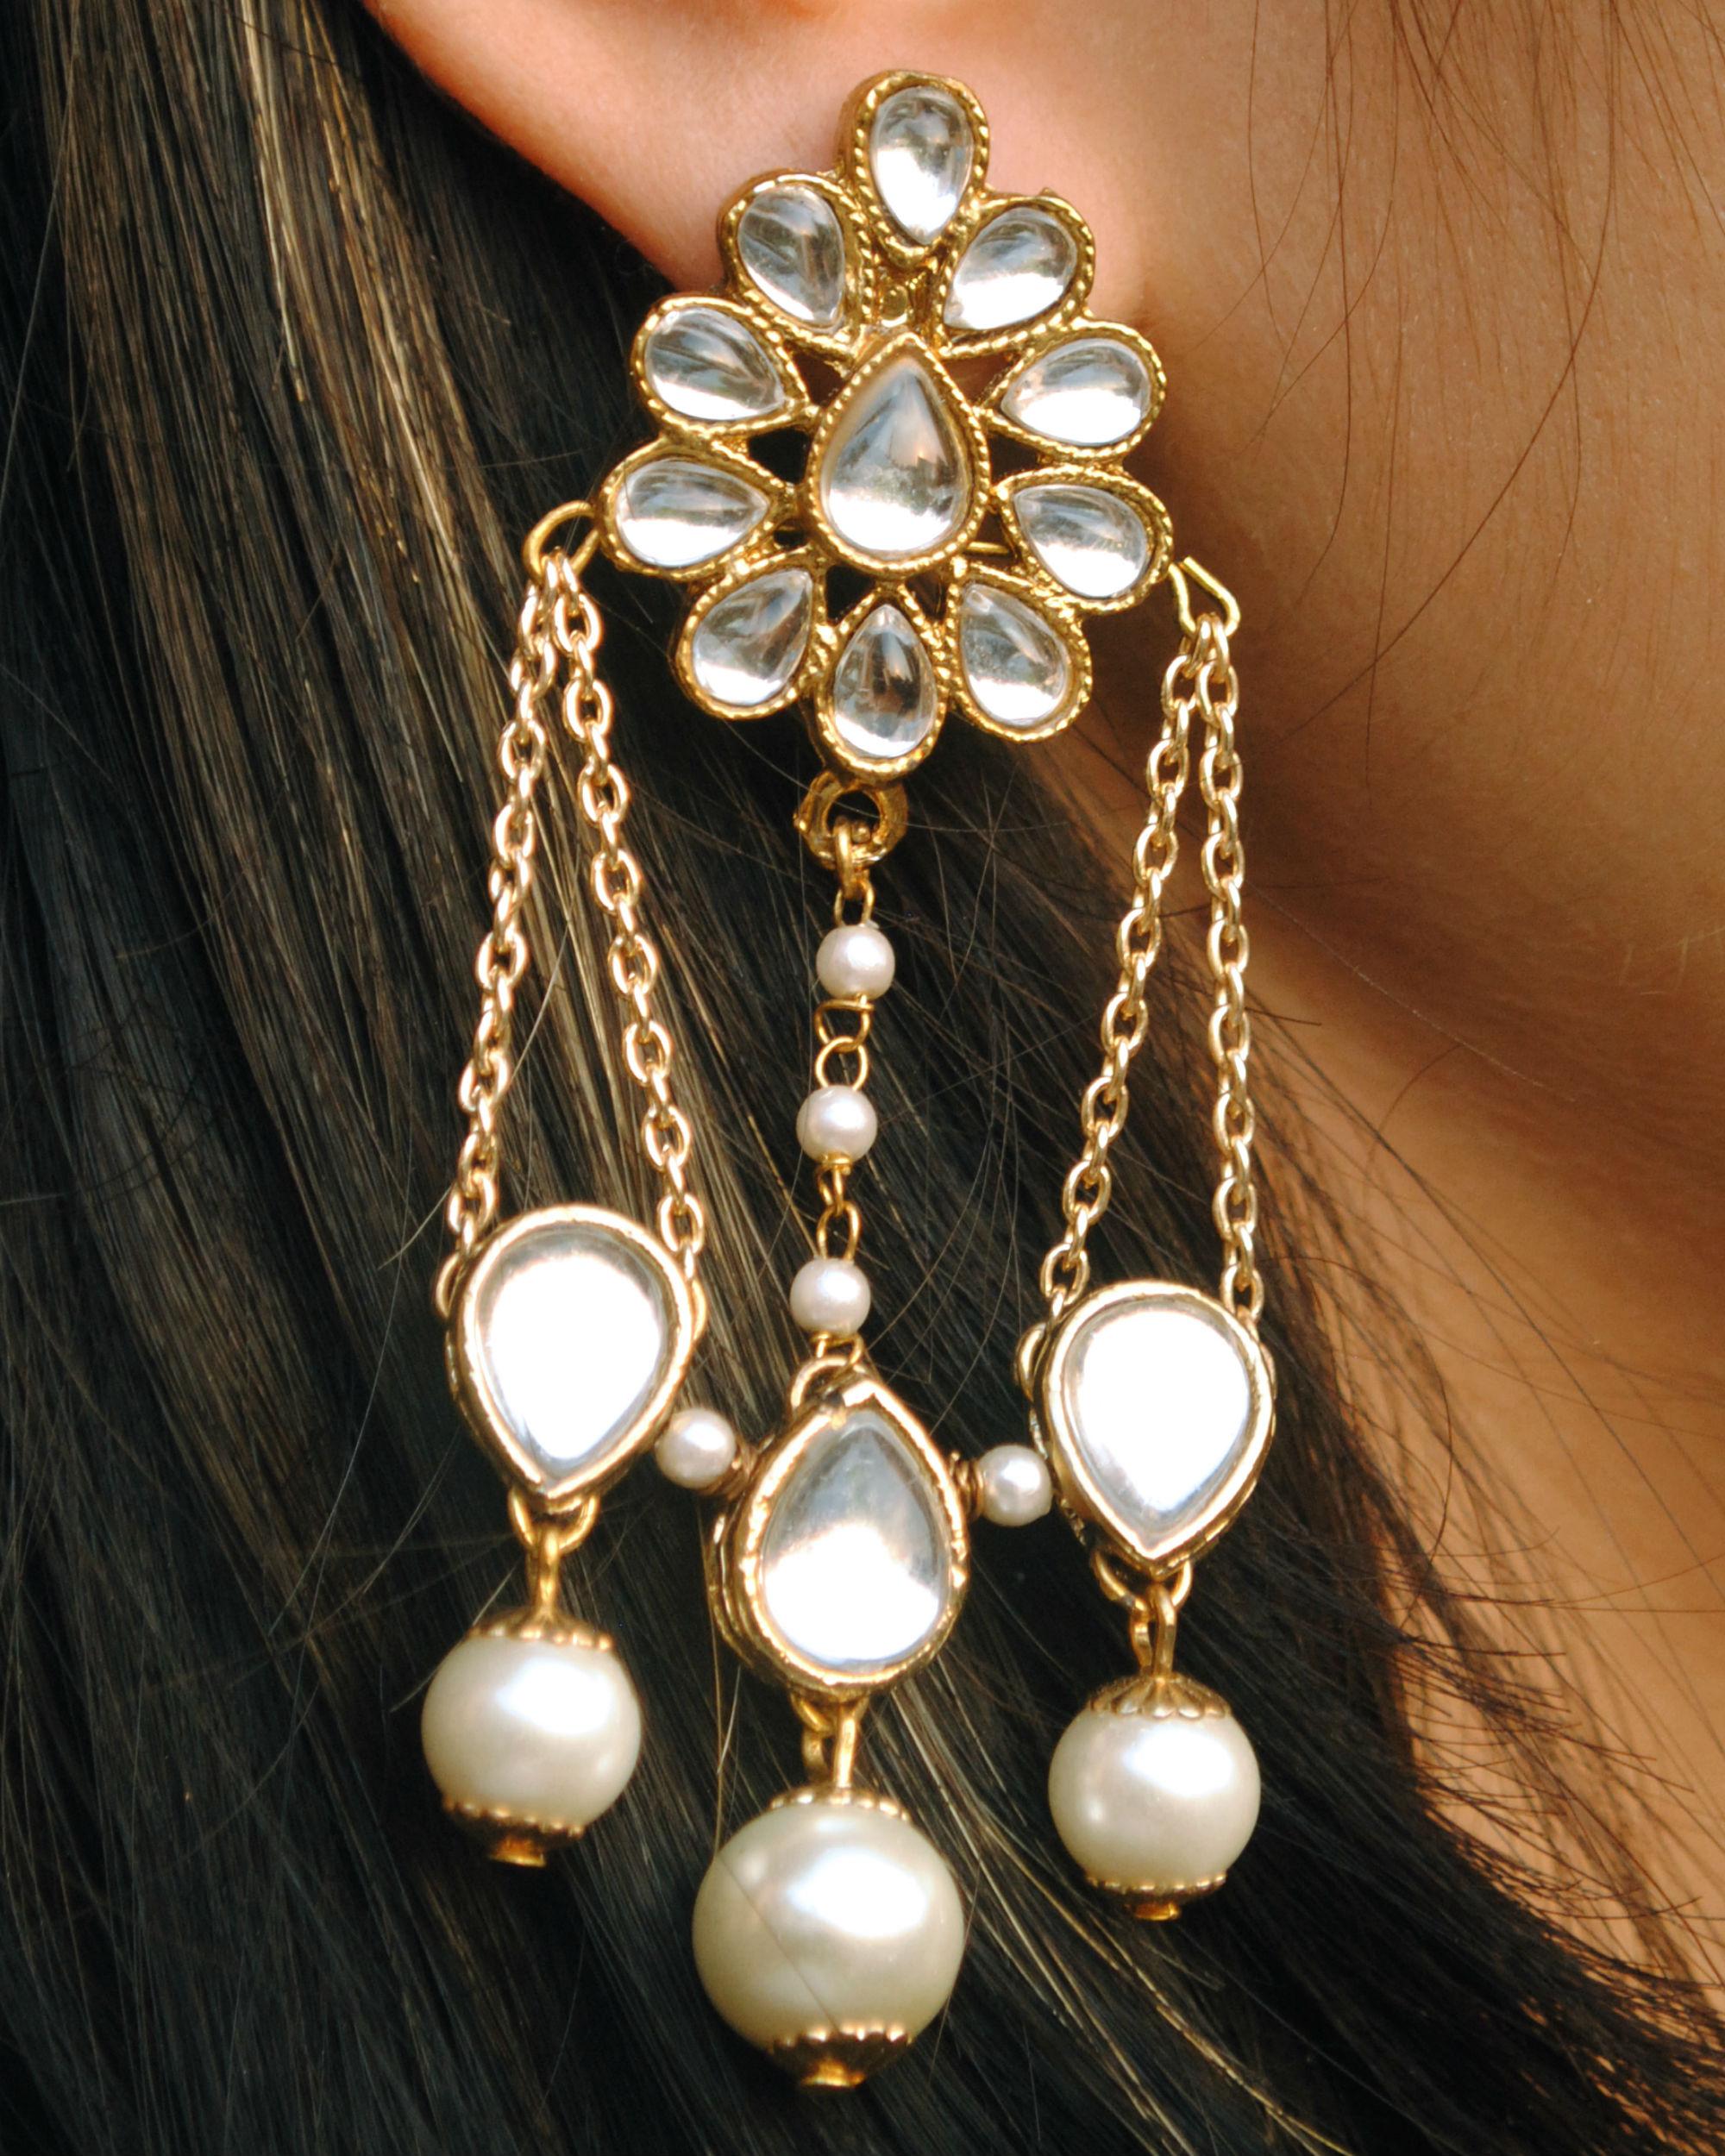 Kundan stud with dangling chain earrings